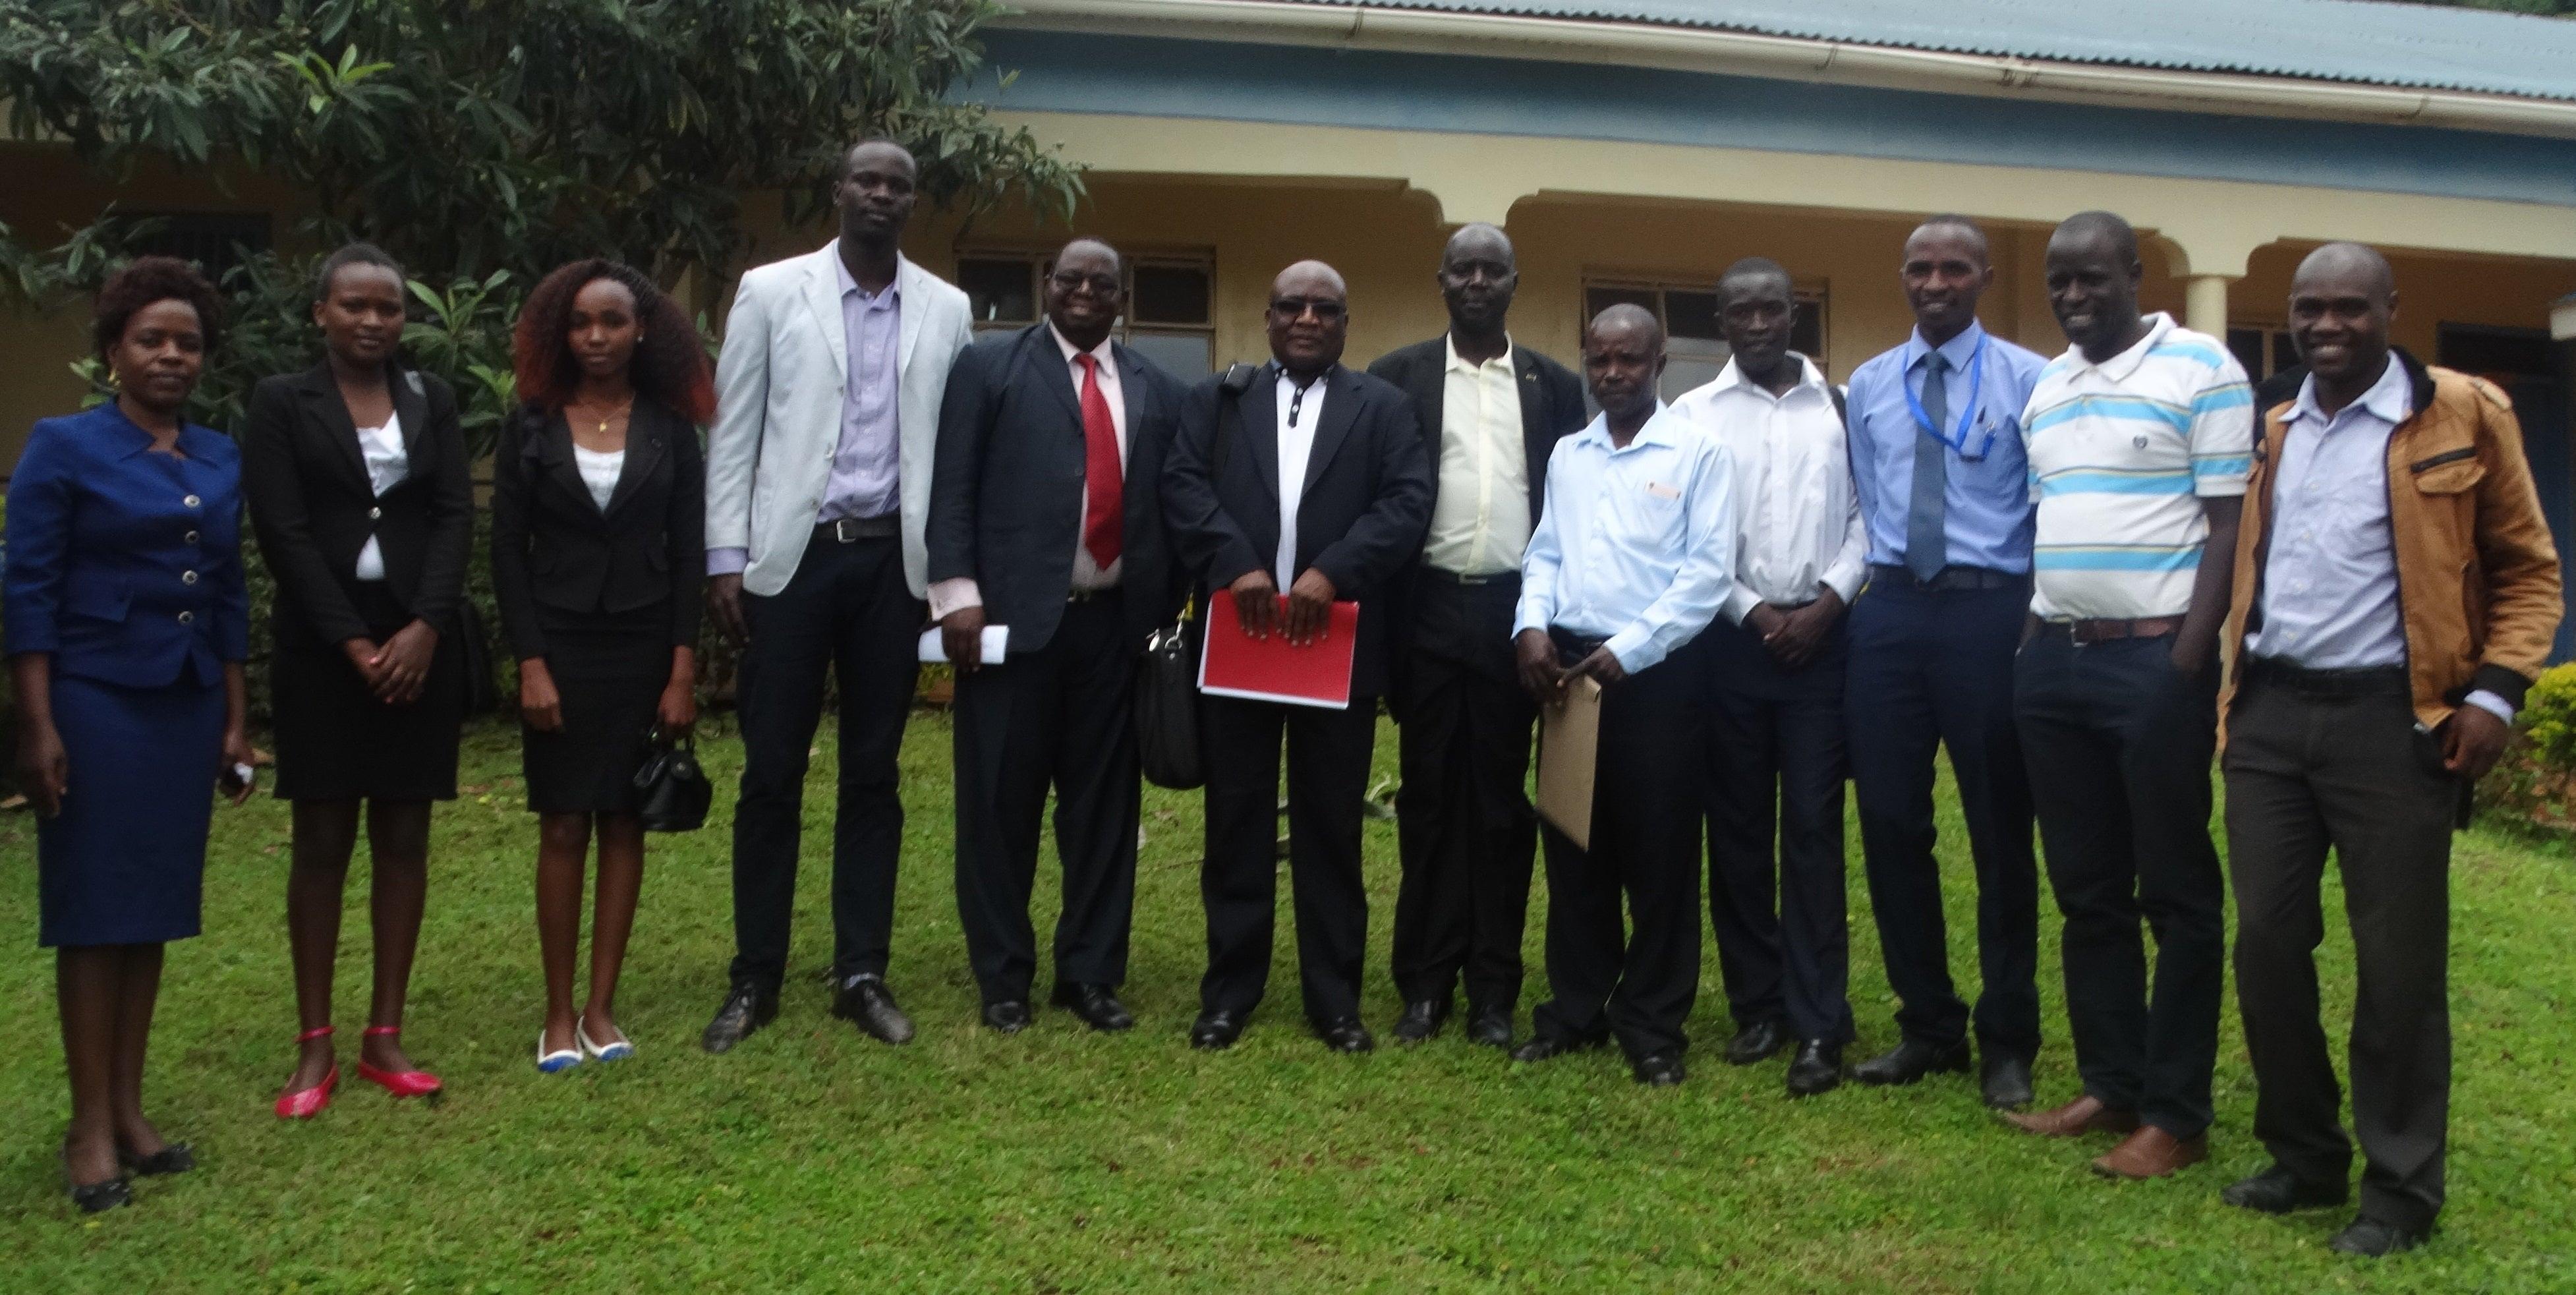 Dr. Kepher Makambi at Kisii University, Kenya 2018